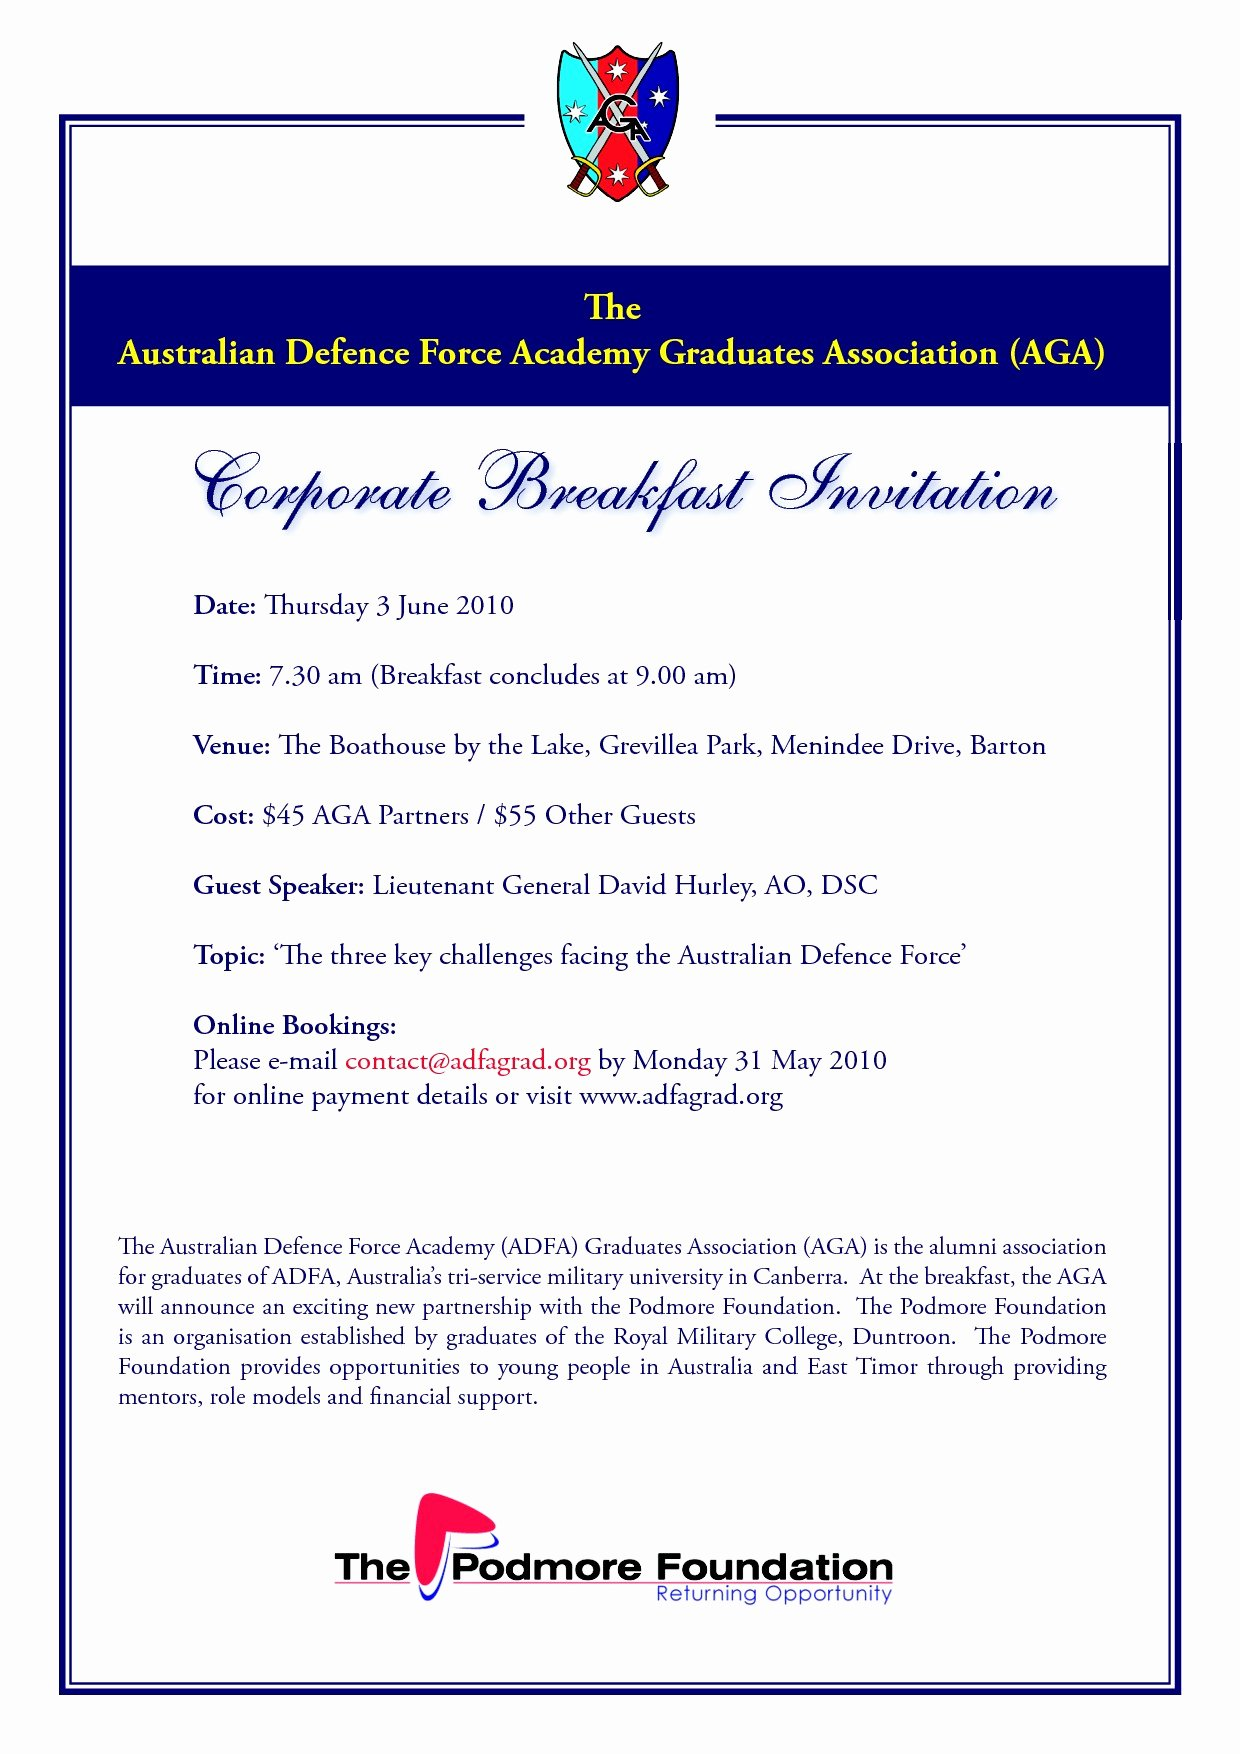 Event Invitation Email Template Unique Sample Invitation Email for An event New Business